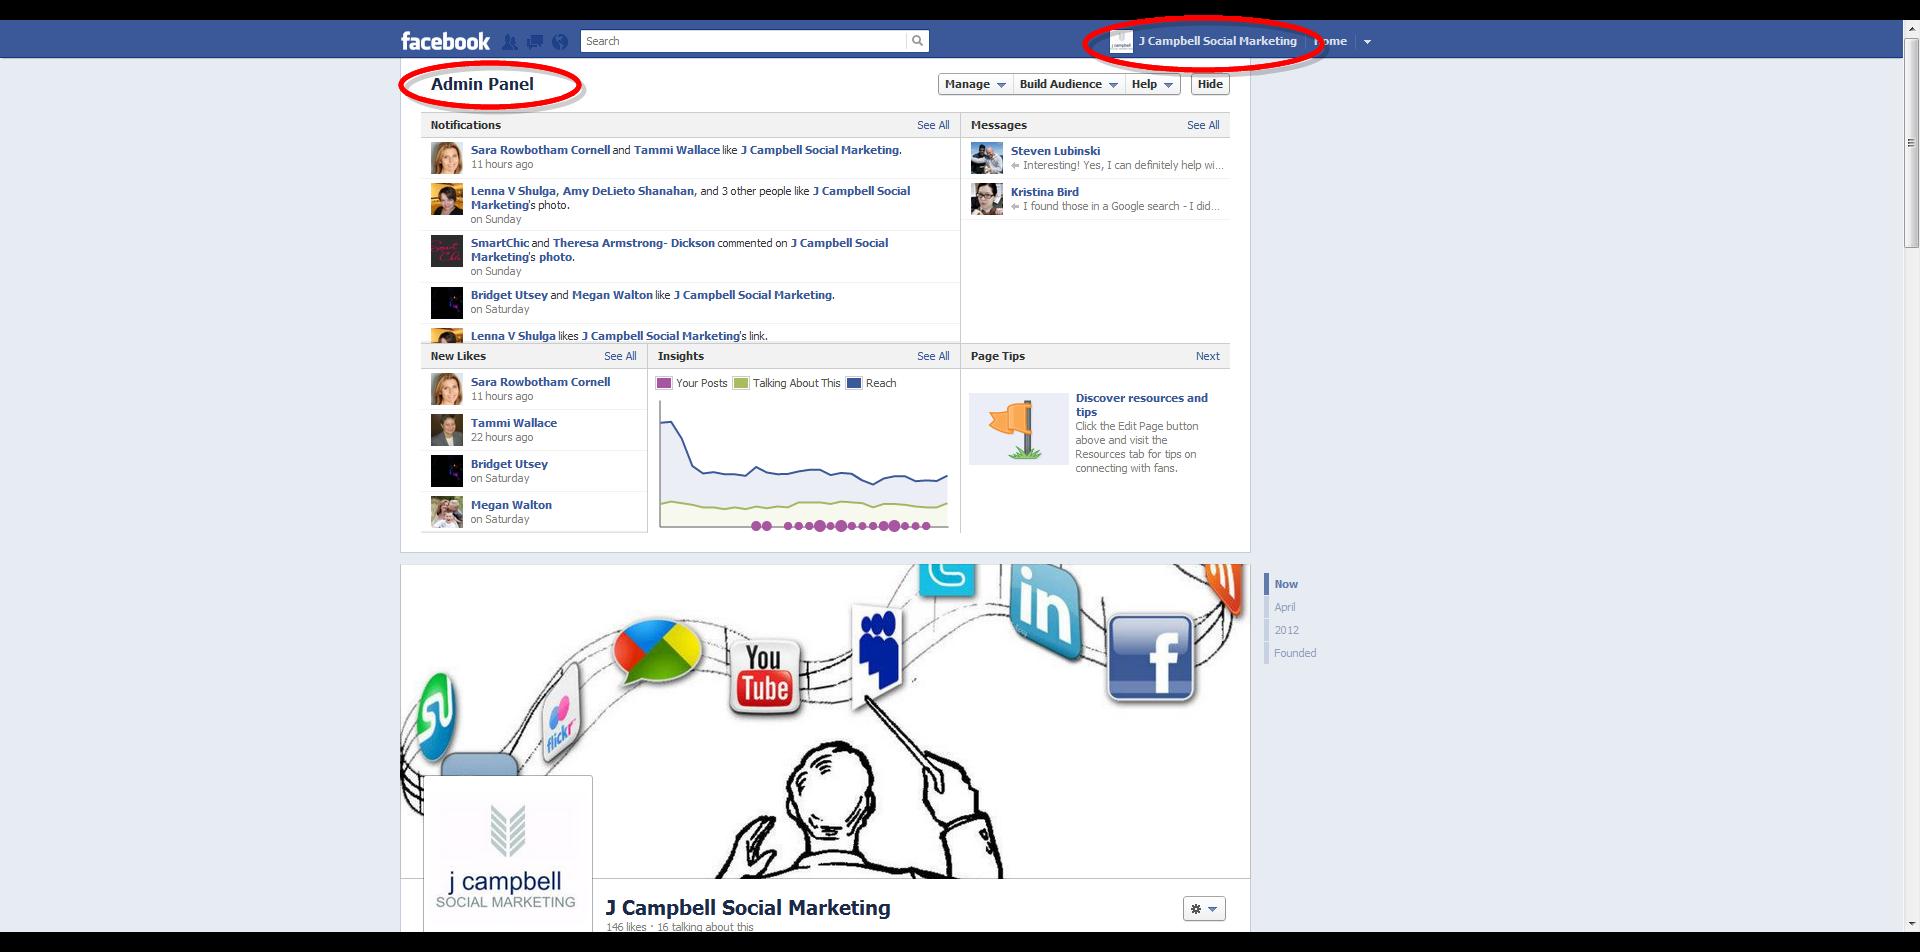 J Campbell Social Marketing Facebook Page